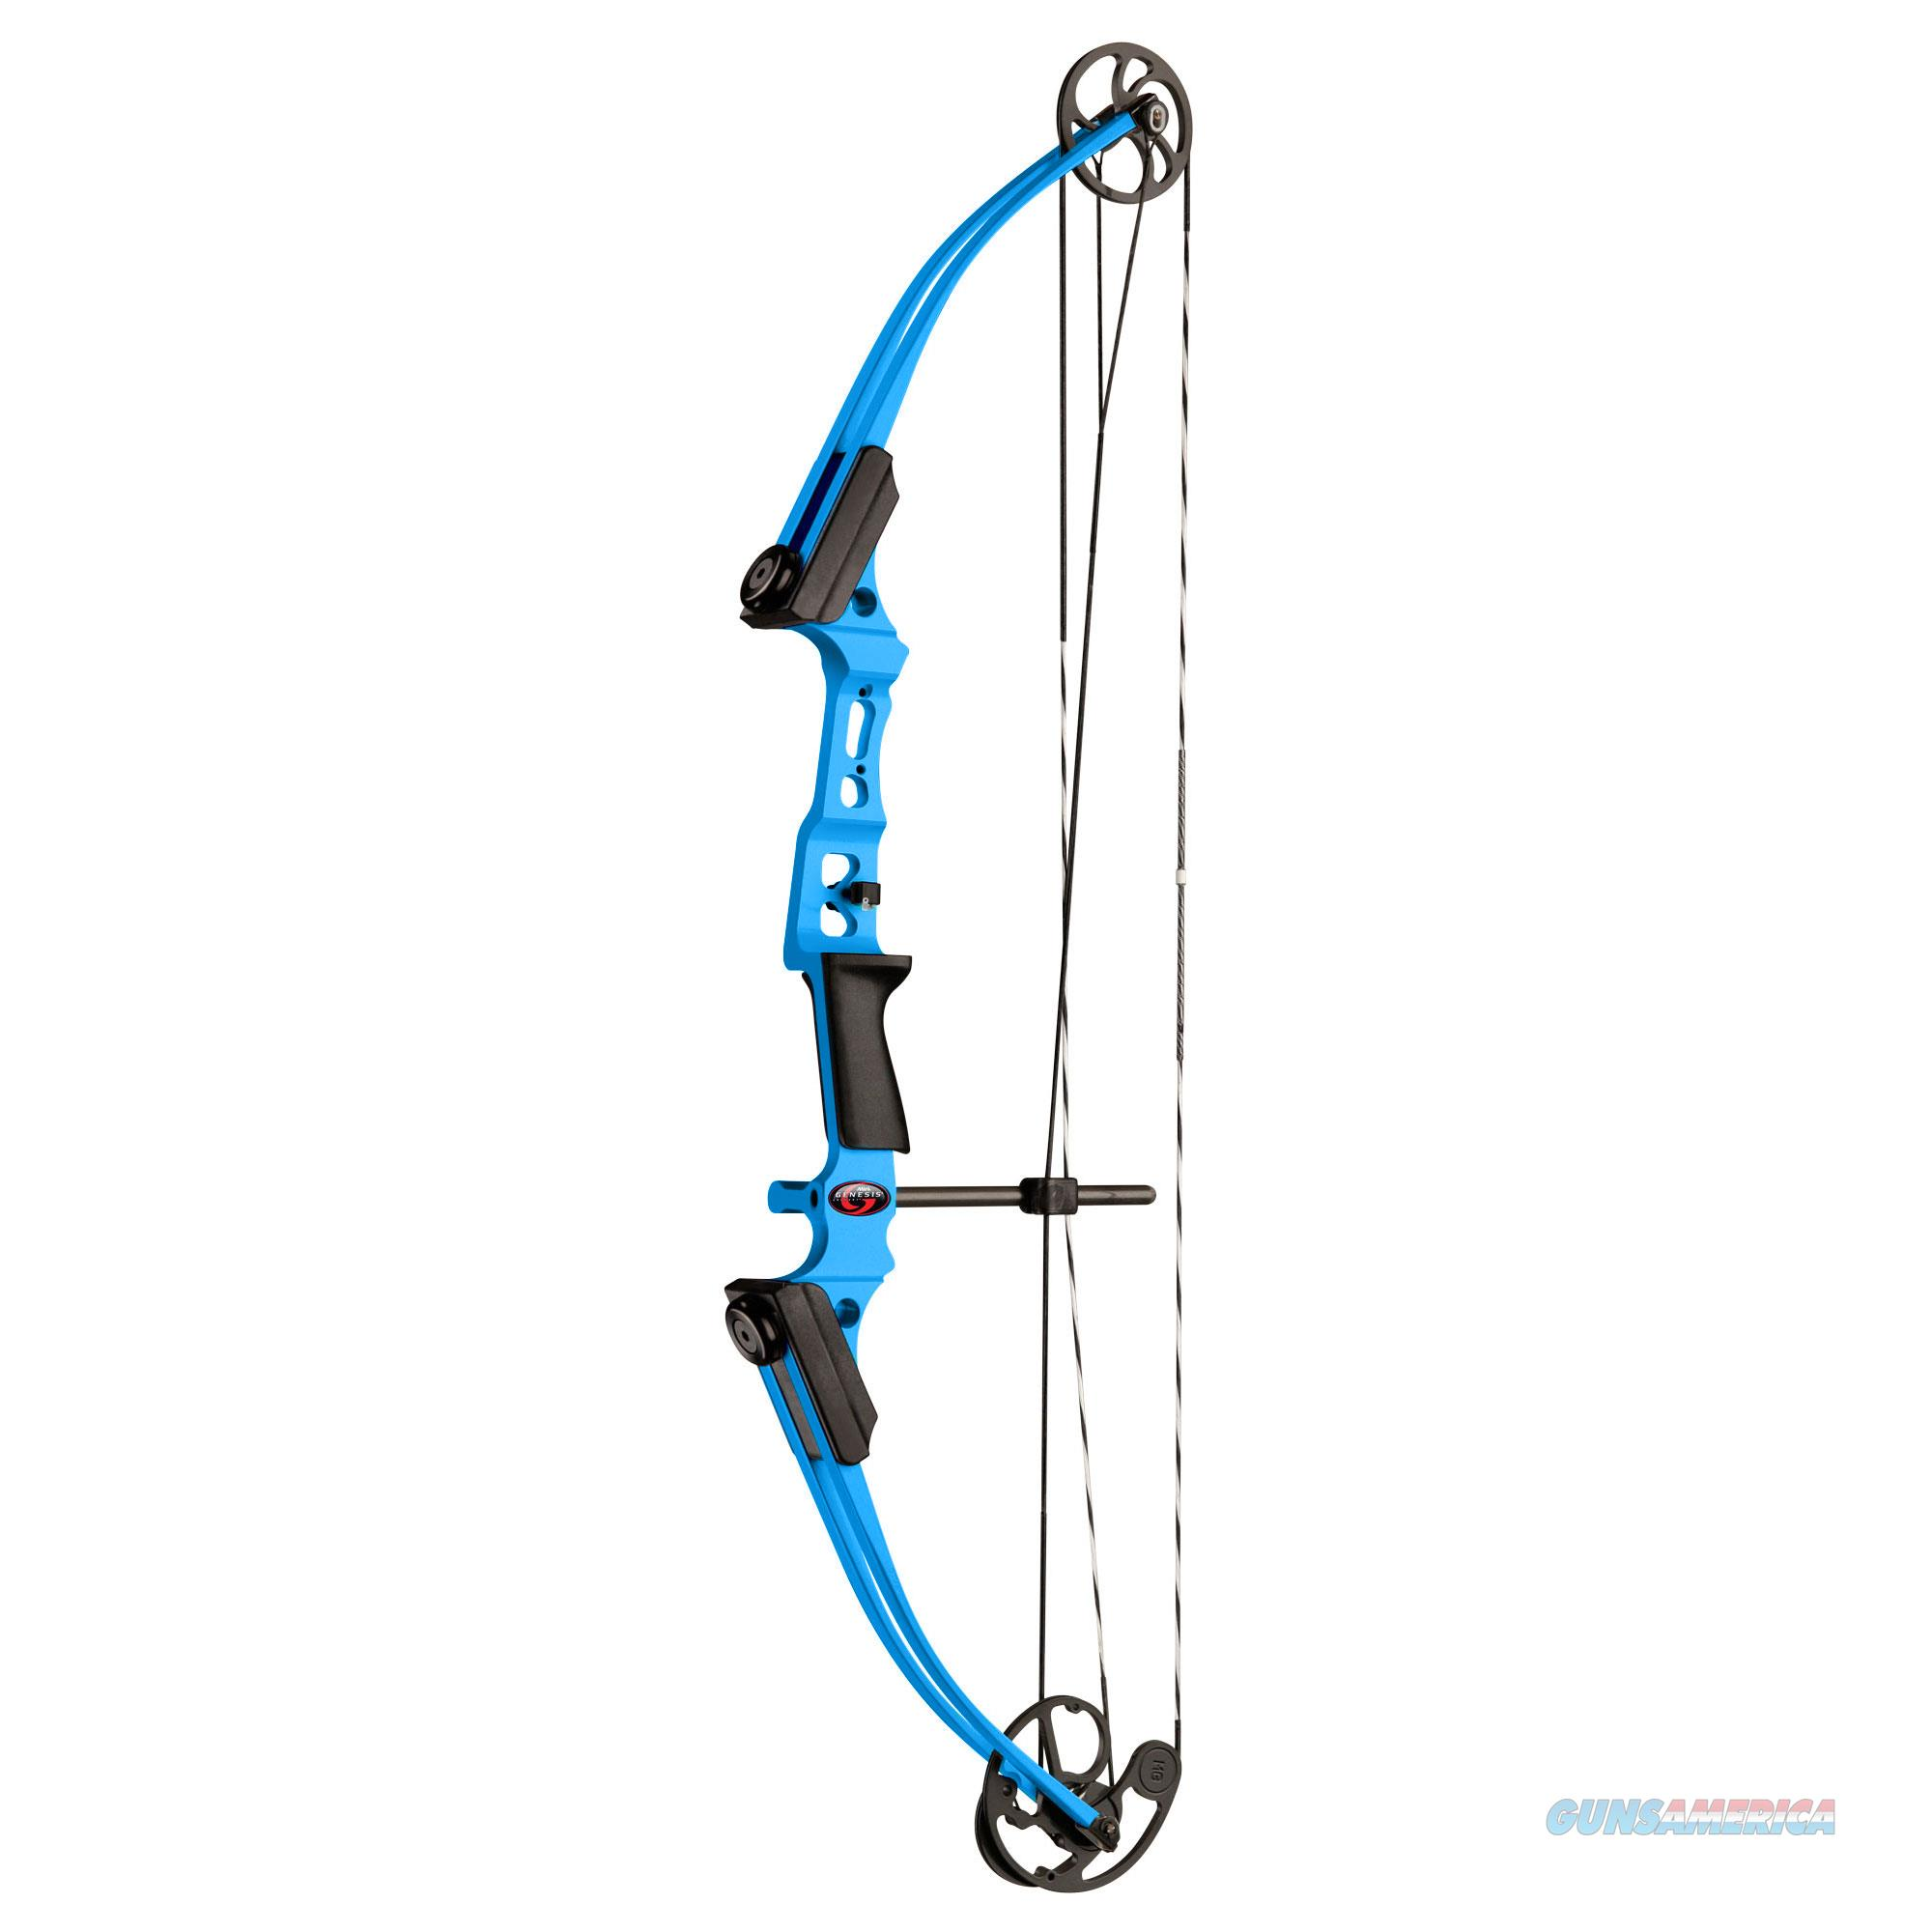 Genesis Mini Bow With Kit 11425  Non-Guns > Archery > Parts